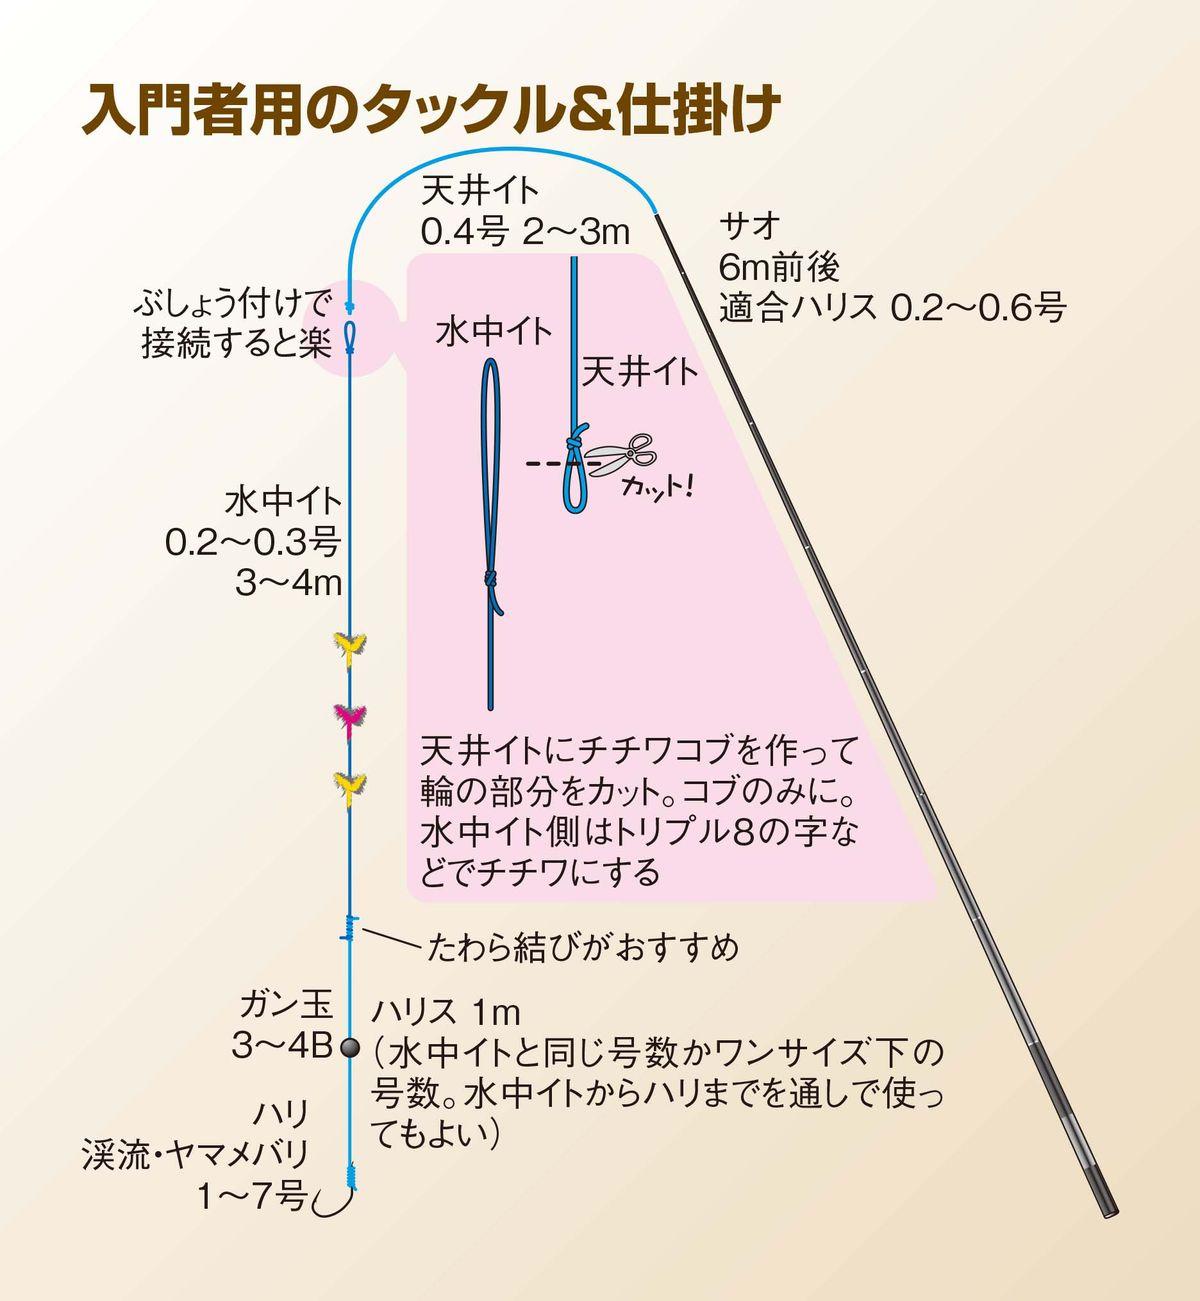 050-055keiryu-nyumon_cs6 (2)